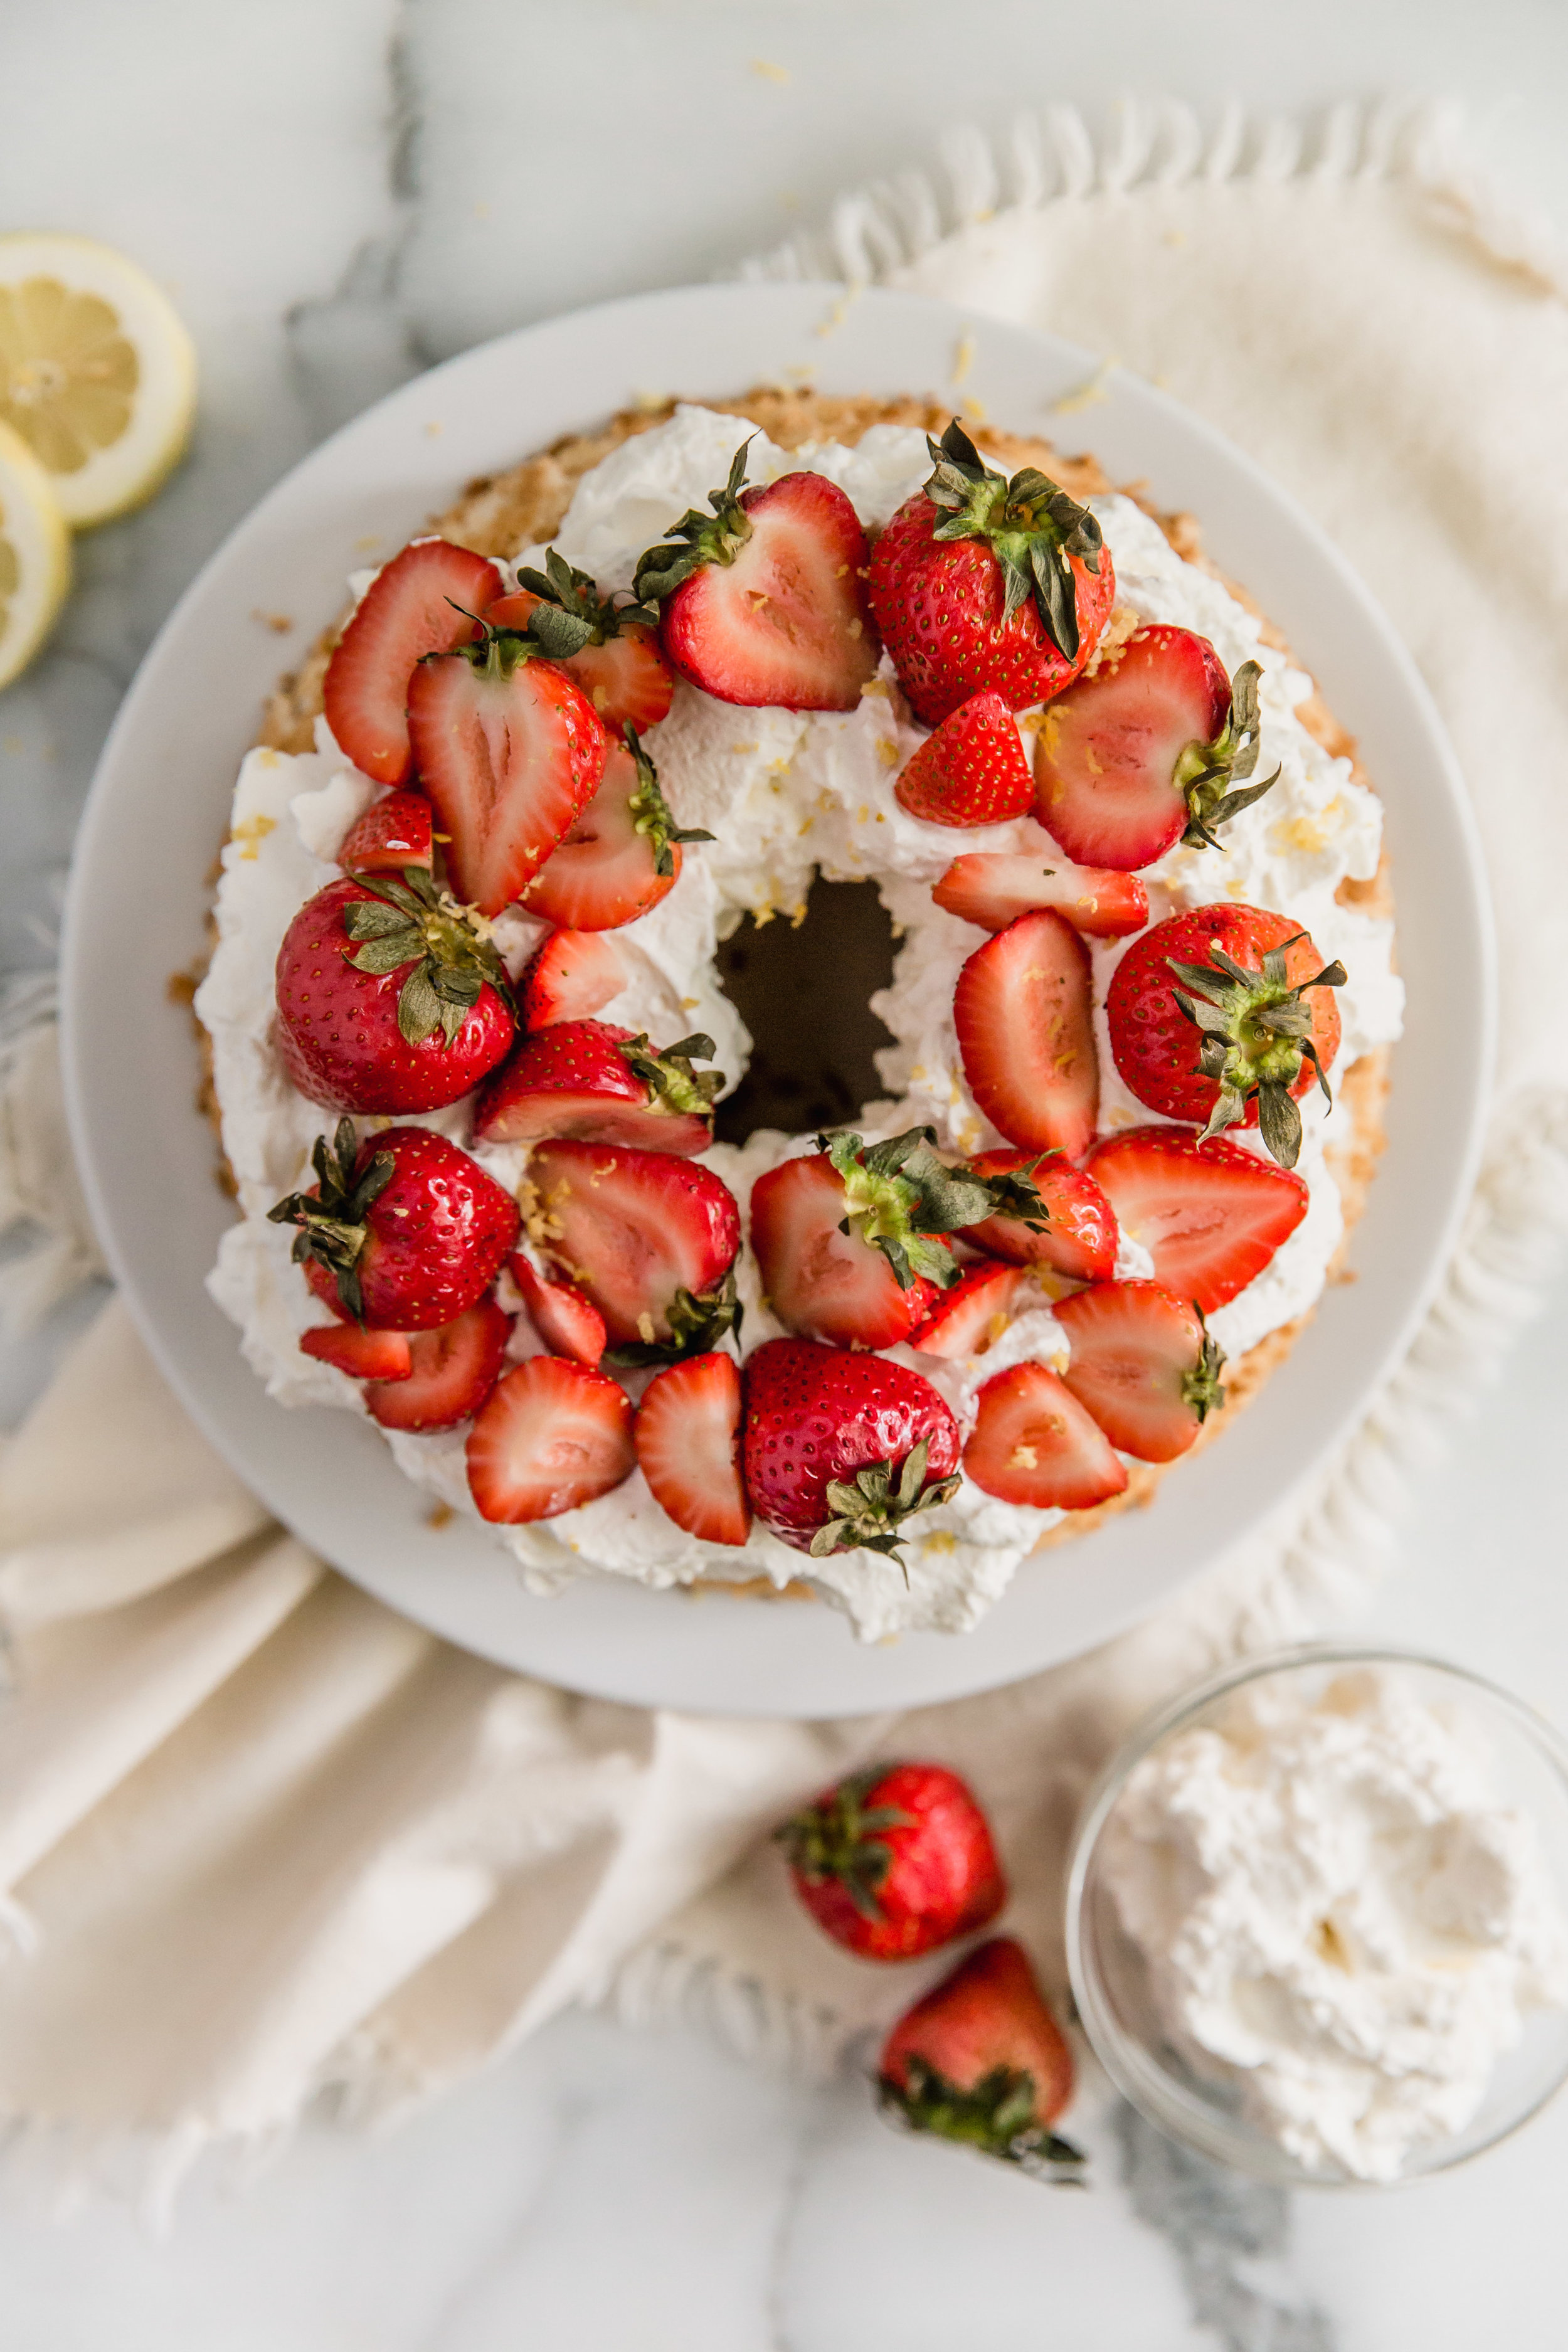 lemon-strawberry-shortcake-3.jpg